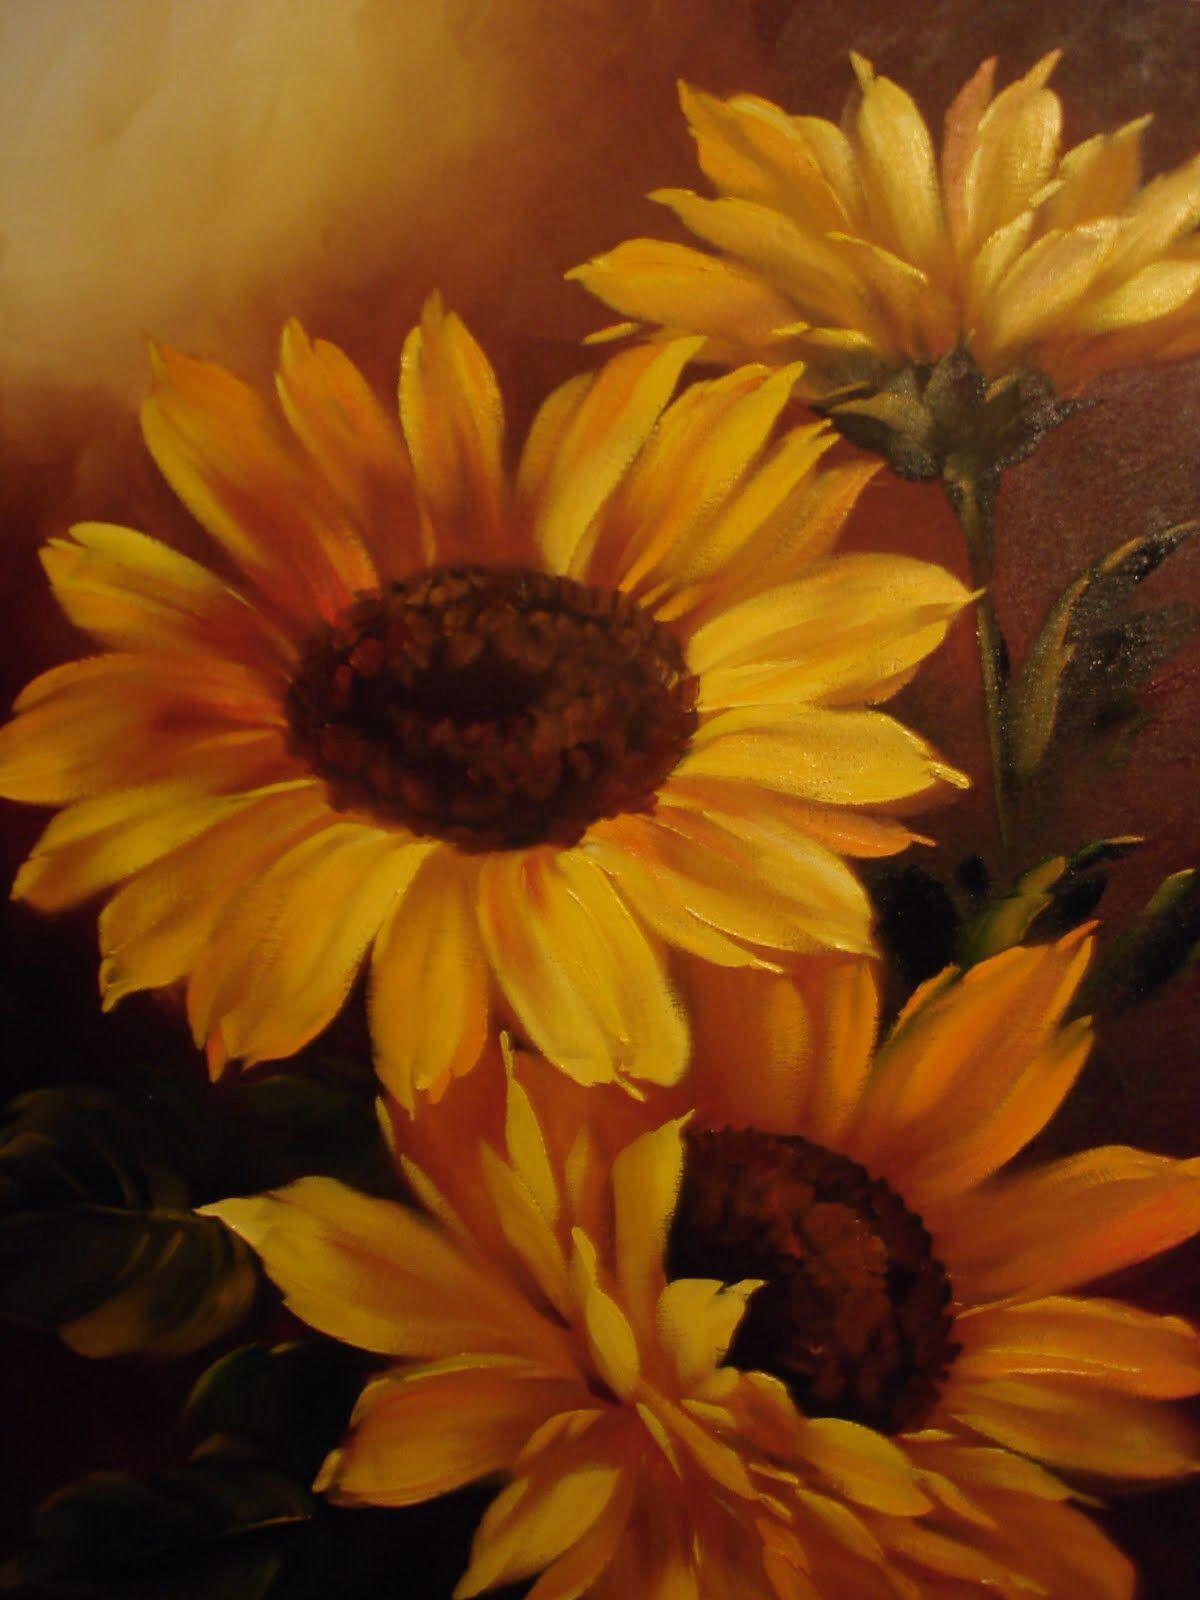 girassol sunflowers in 2019